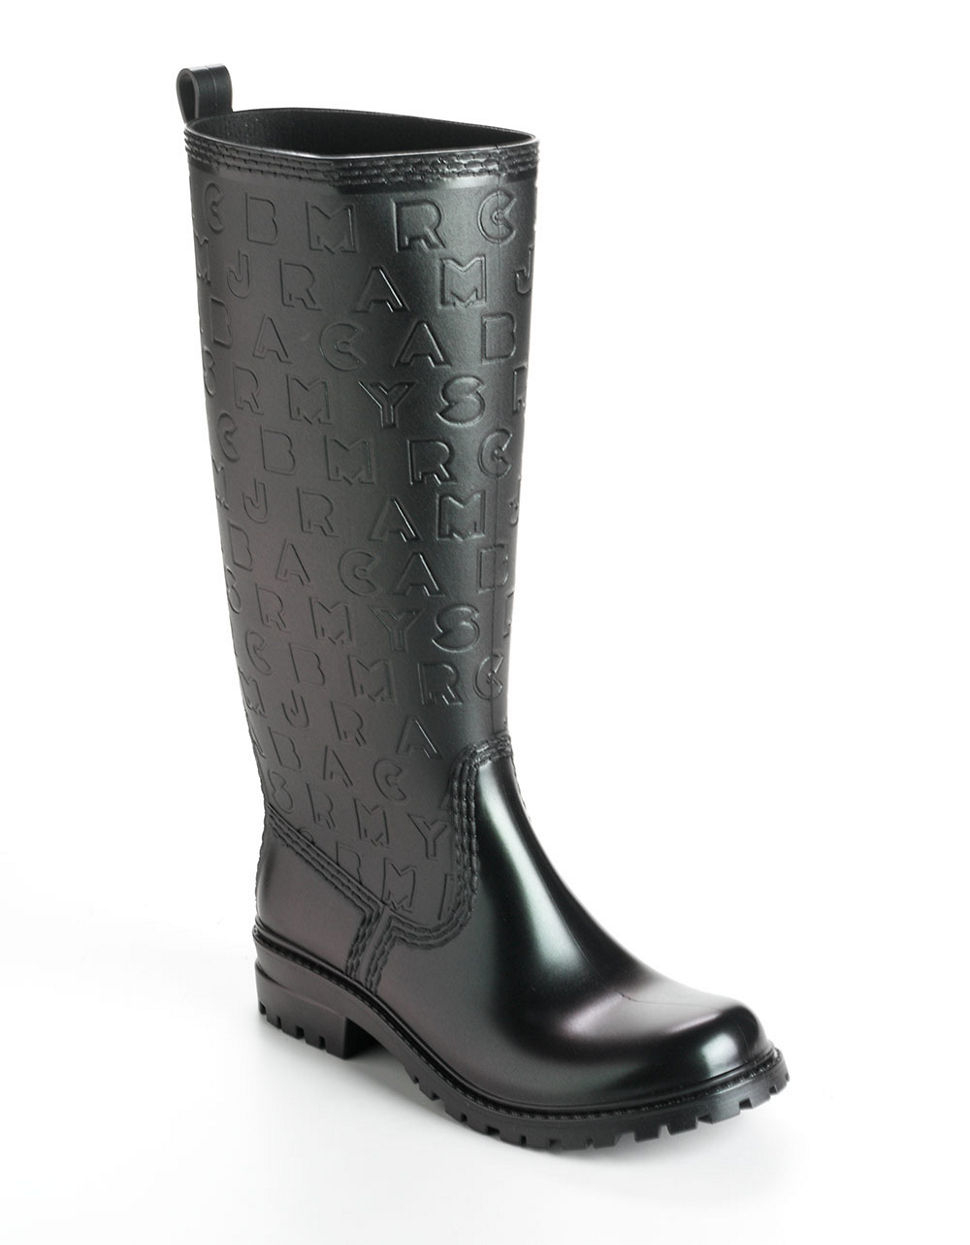 marc by marc jacobs logo glitter rain boots in black. Black Bedroom Furniture Sets. Home Design Ideas